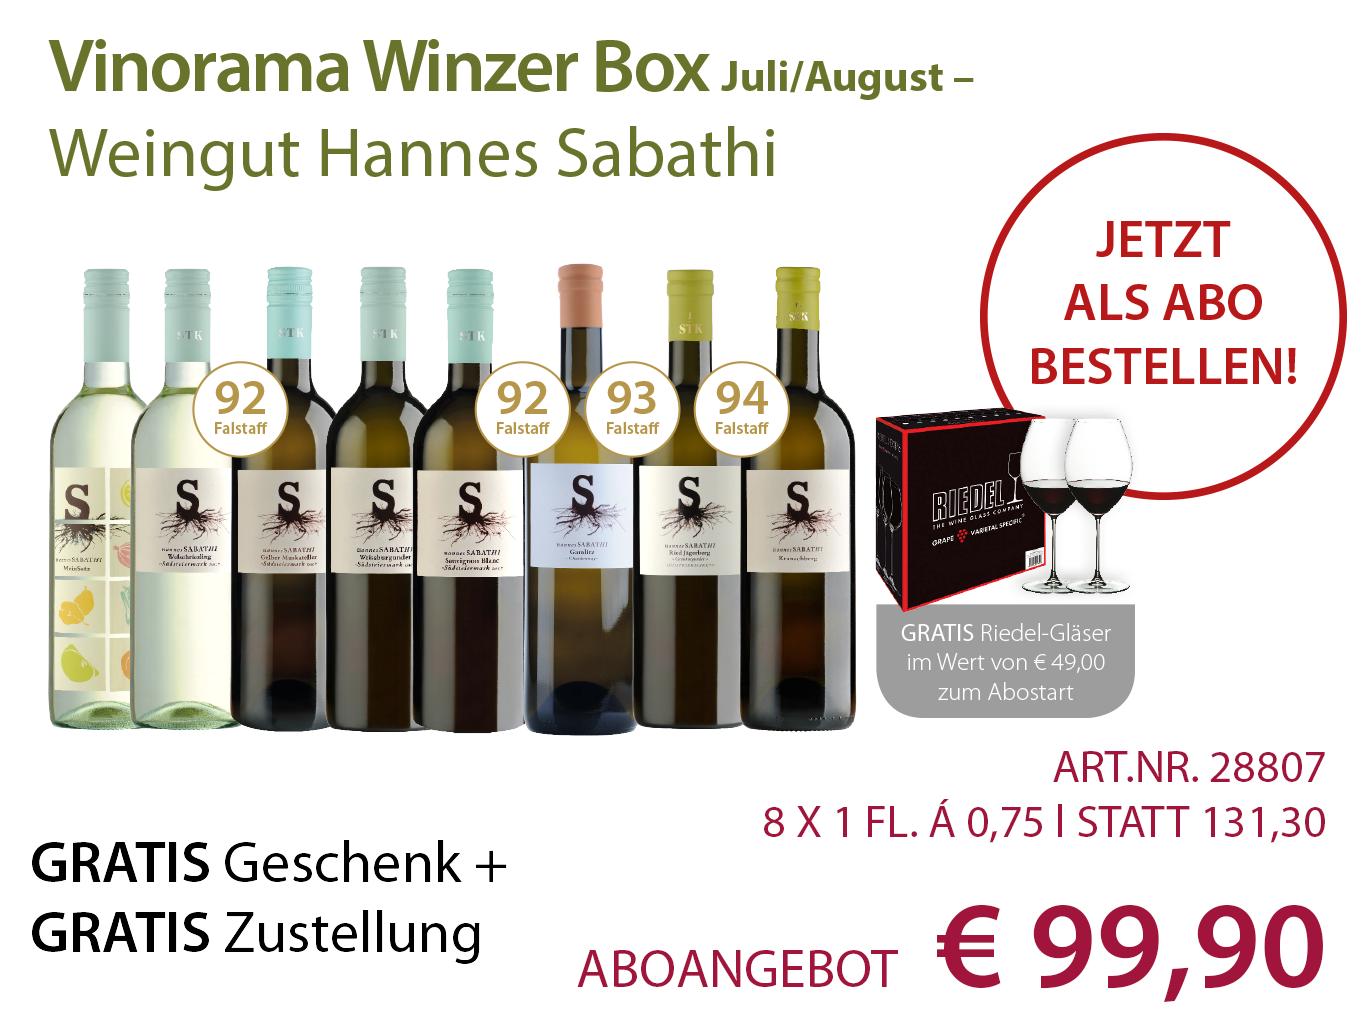 Vinorama Winzer Box Abo